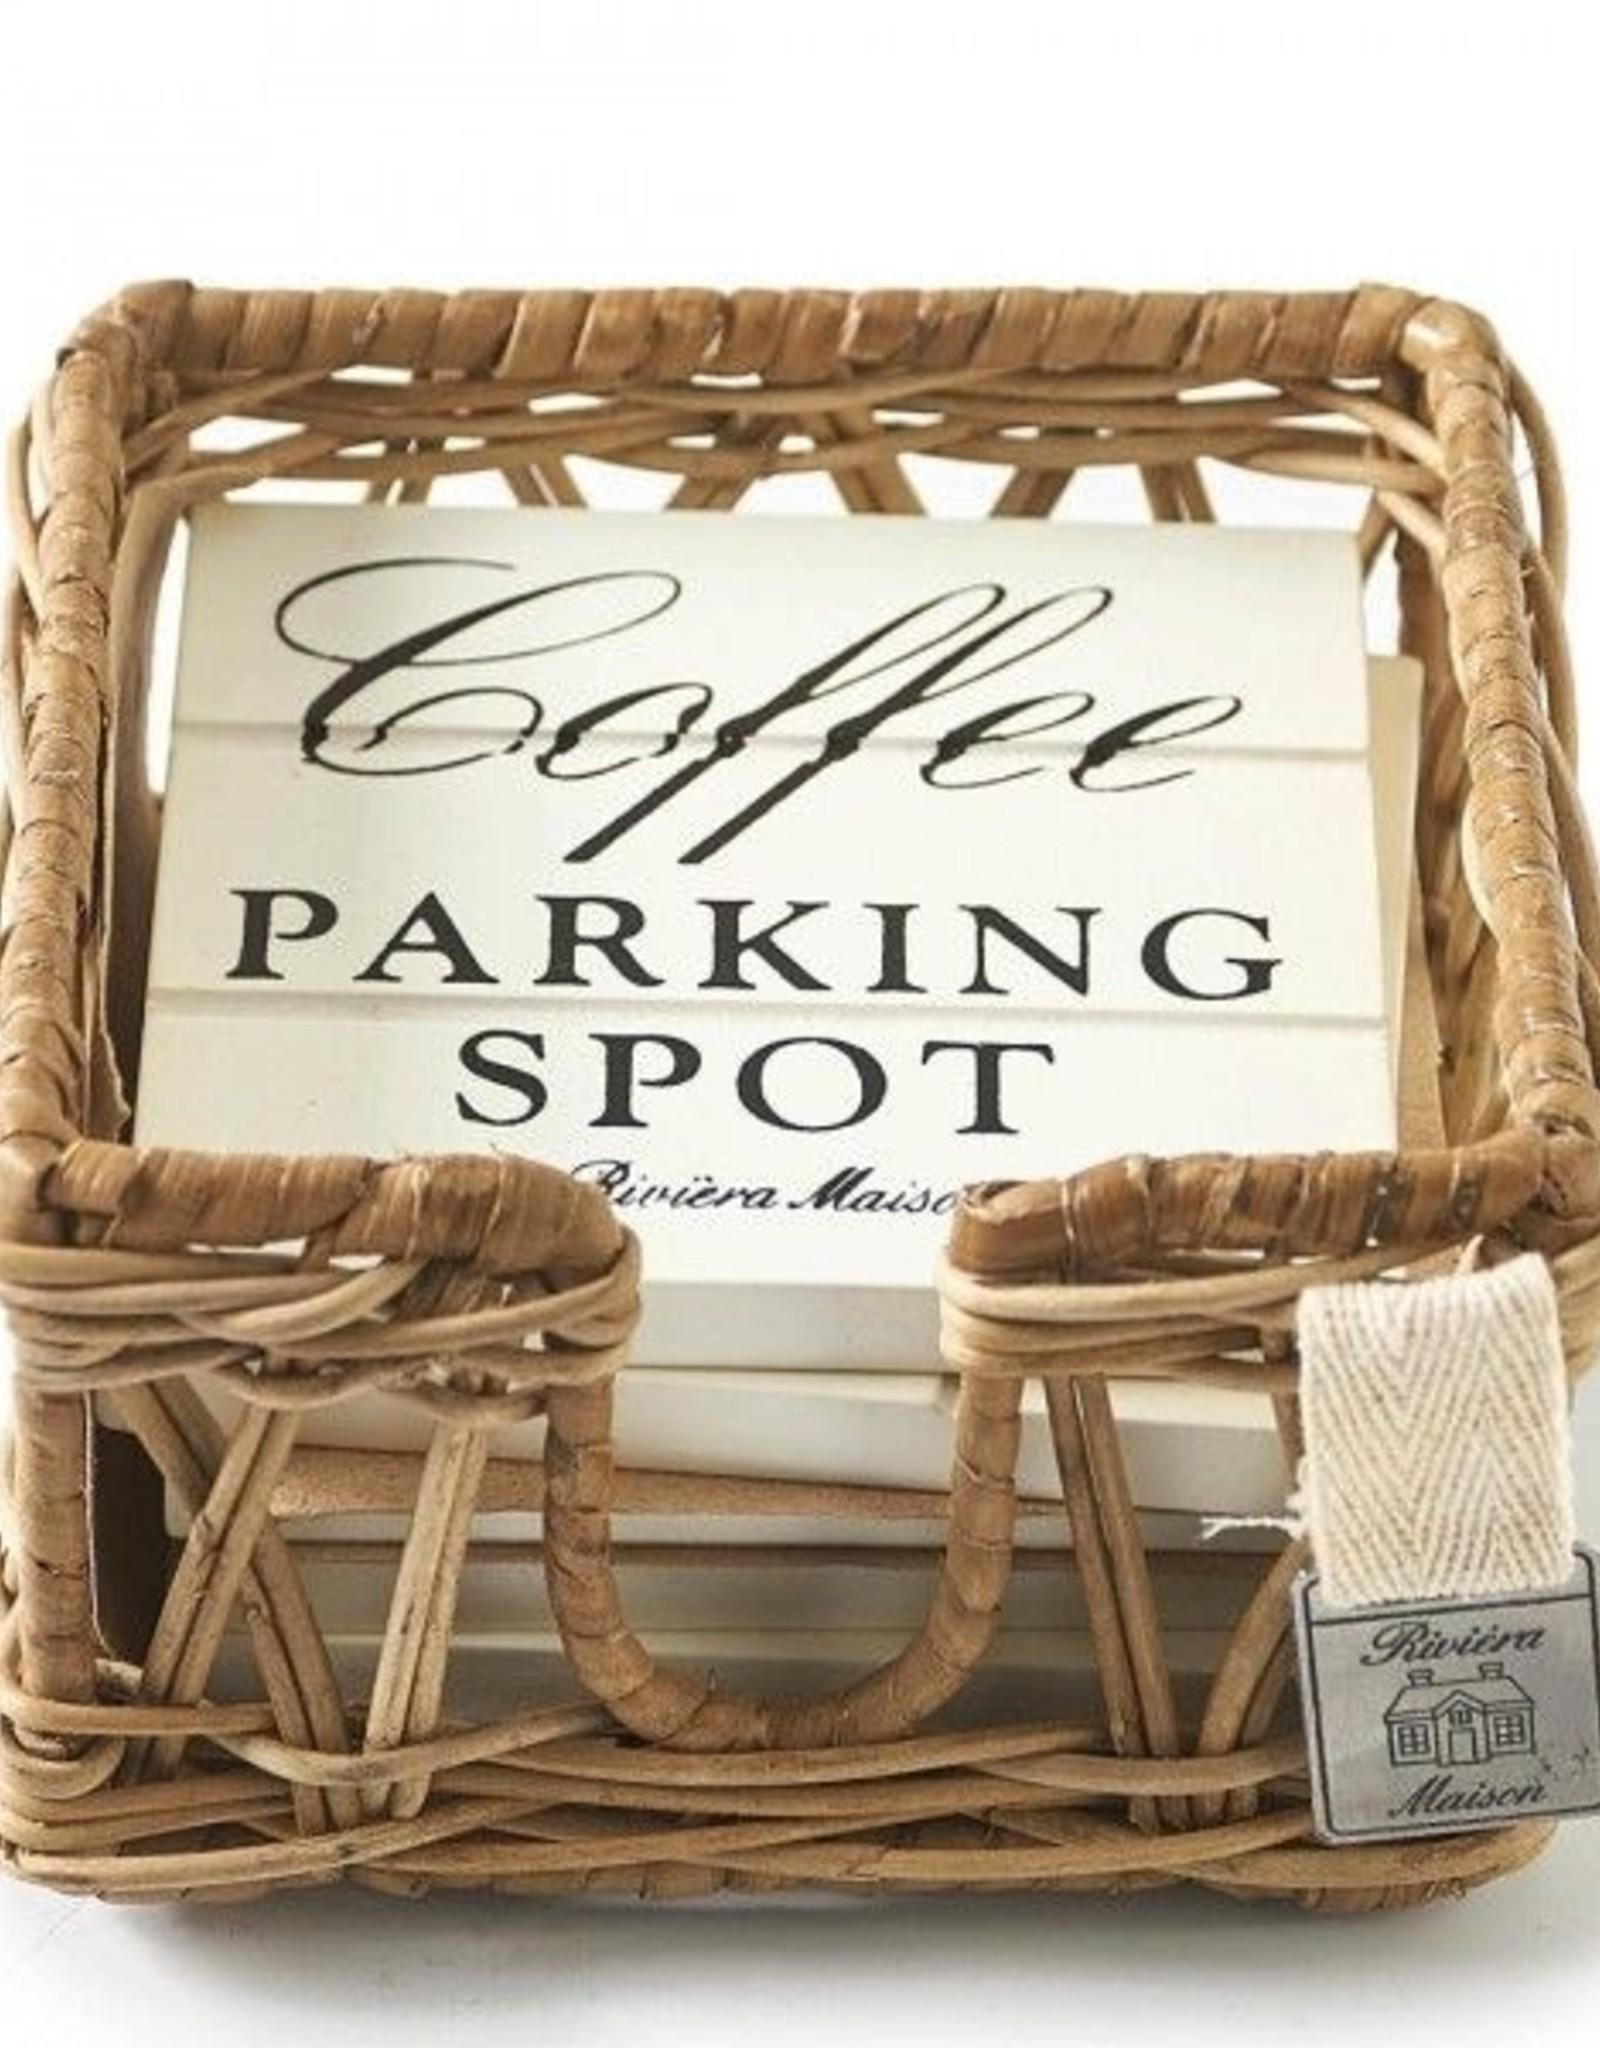 Riviera Maison Parking spot coasters